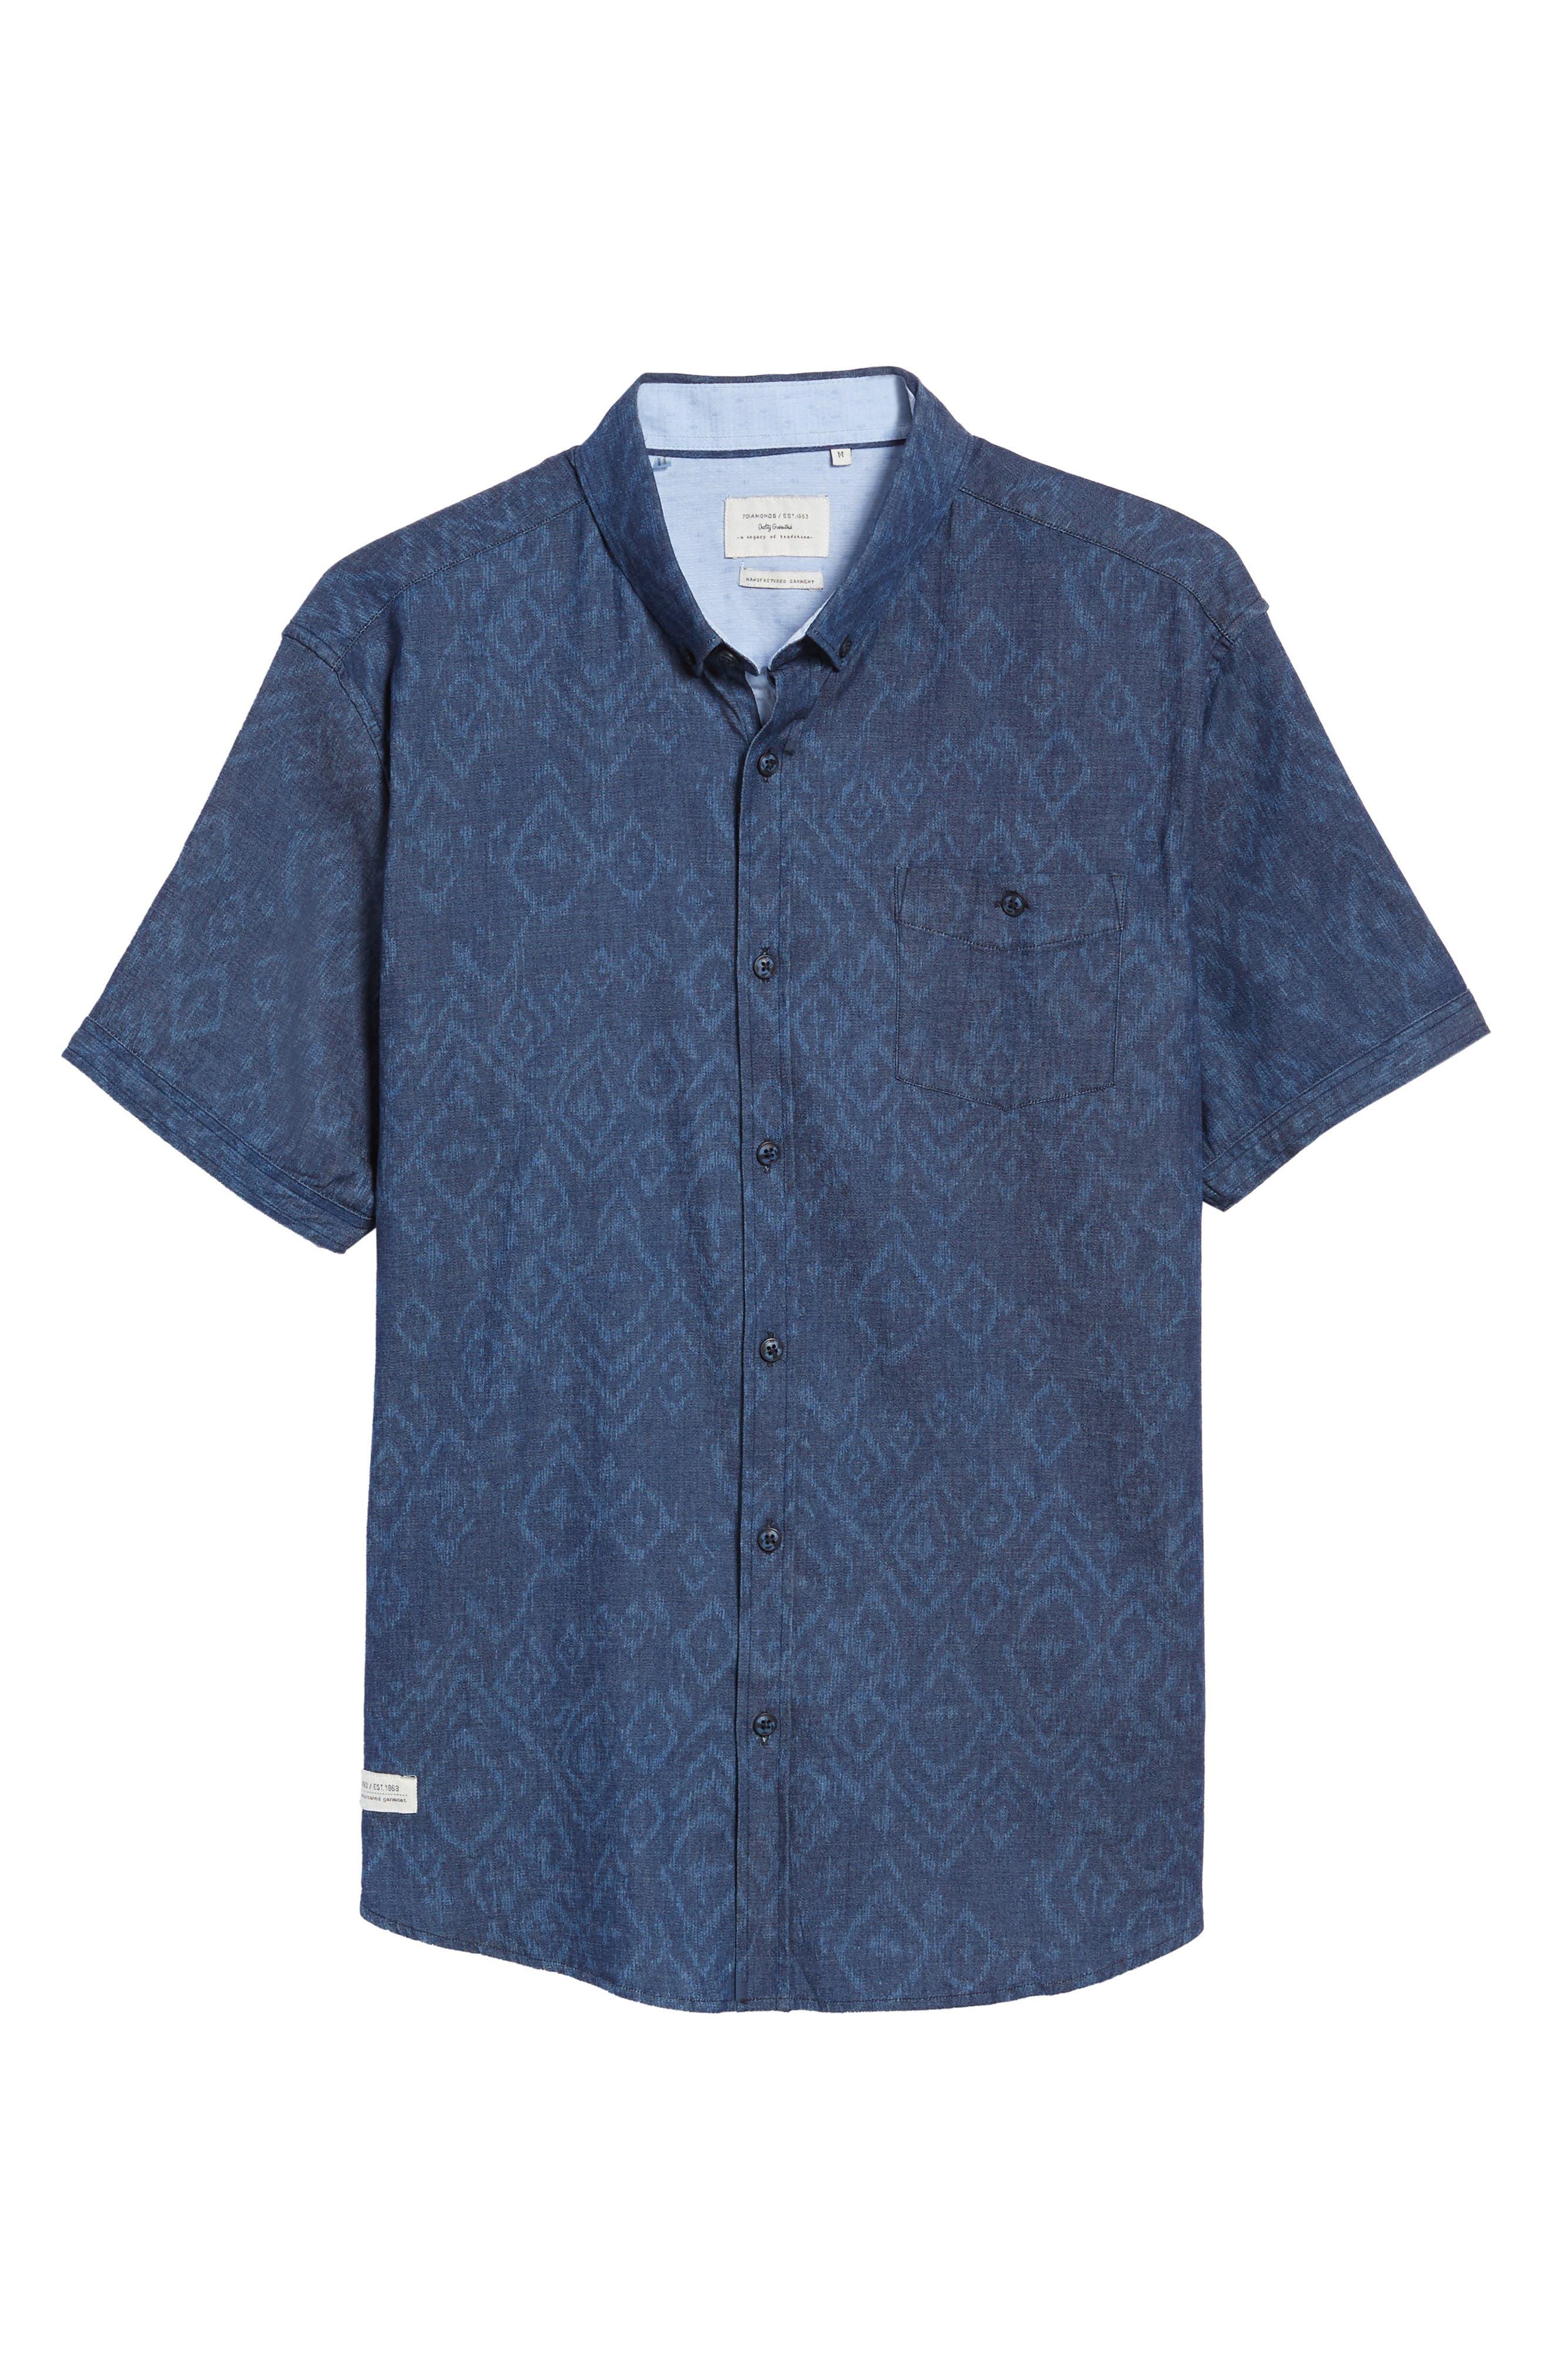 Marquee Moon Print Woven Shirt,                             Alternate thumbnail 6, color,                             410